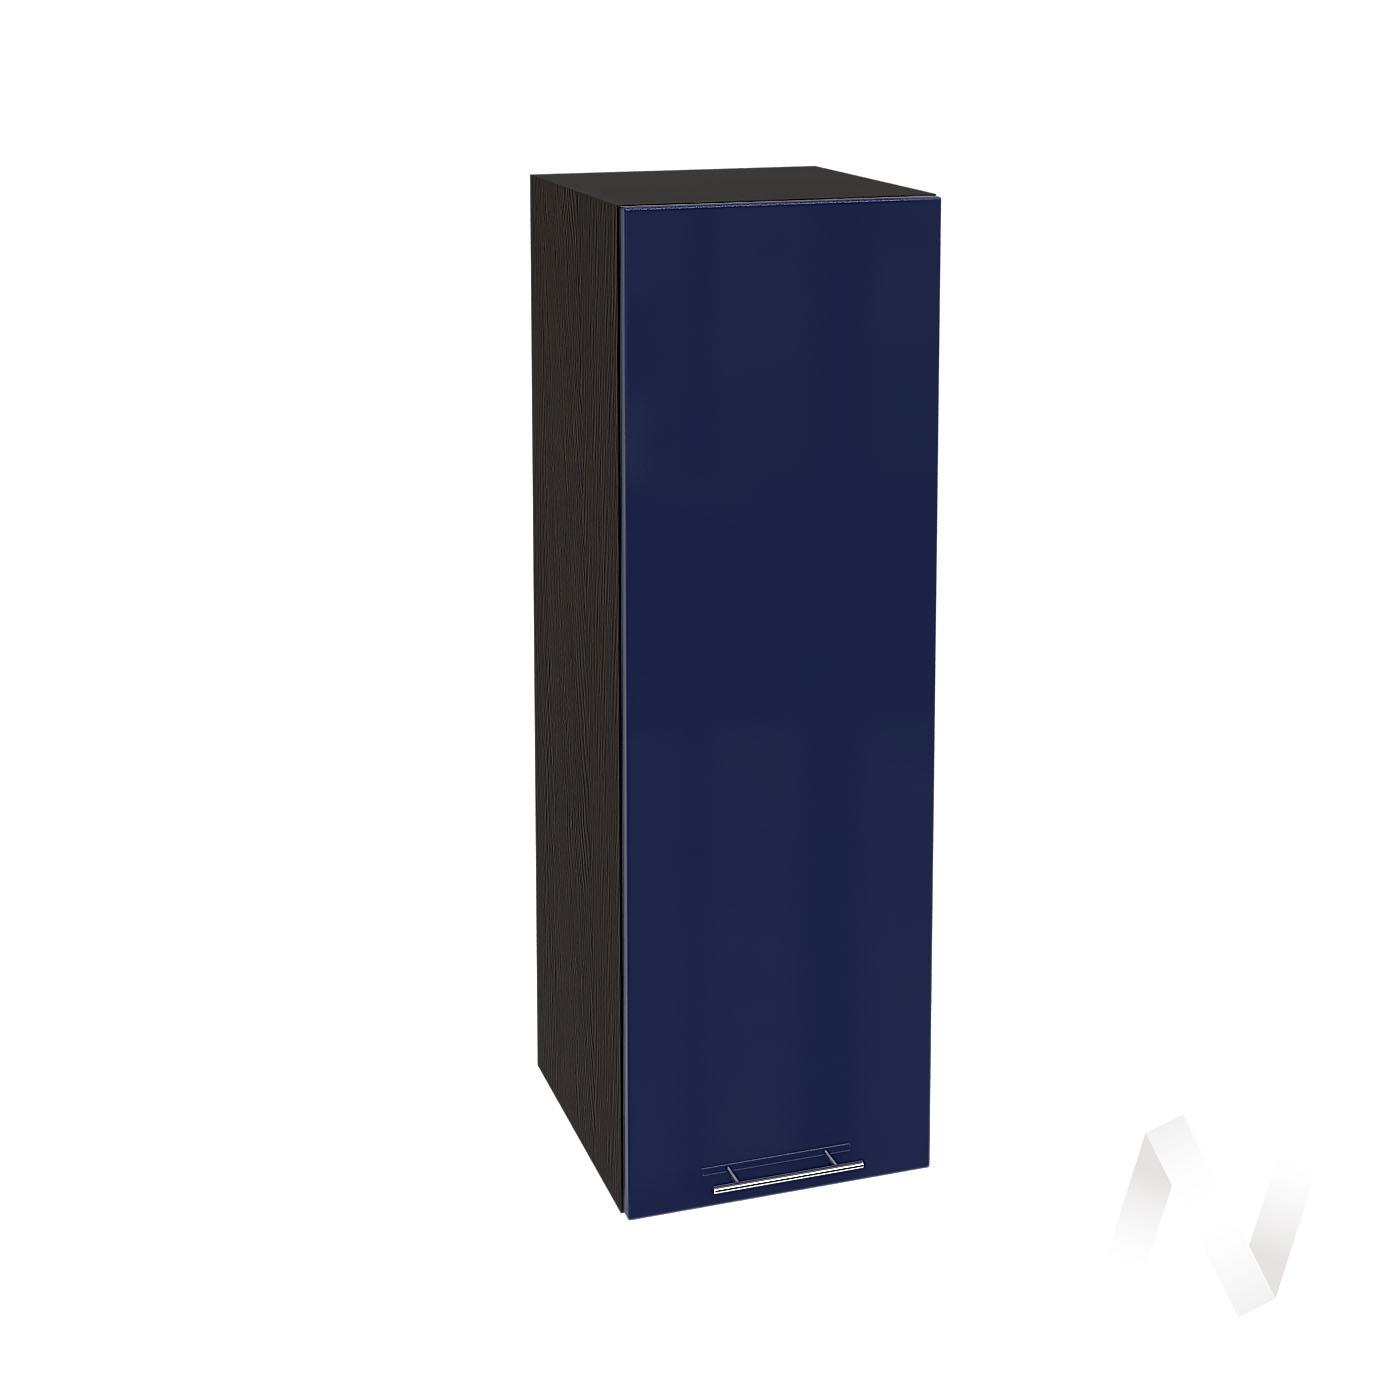 "Кухня ""Валерия-М"": Шкаф верхний 309, ШВ 309 (Синий глянец/корпус венге)"